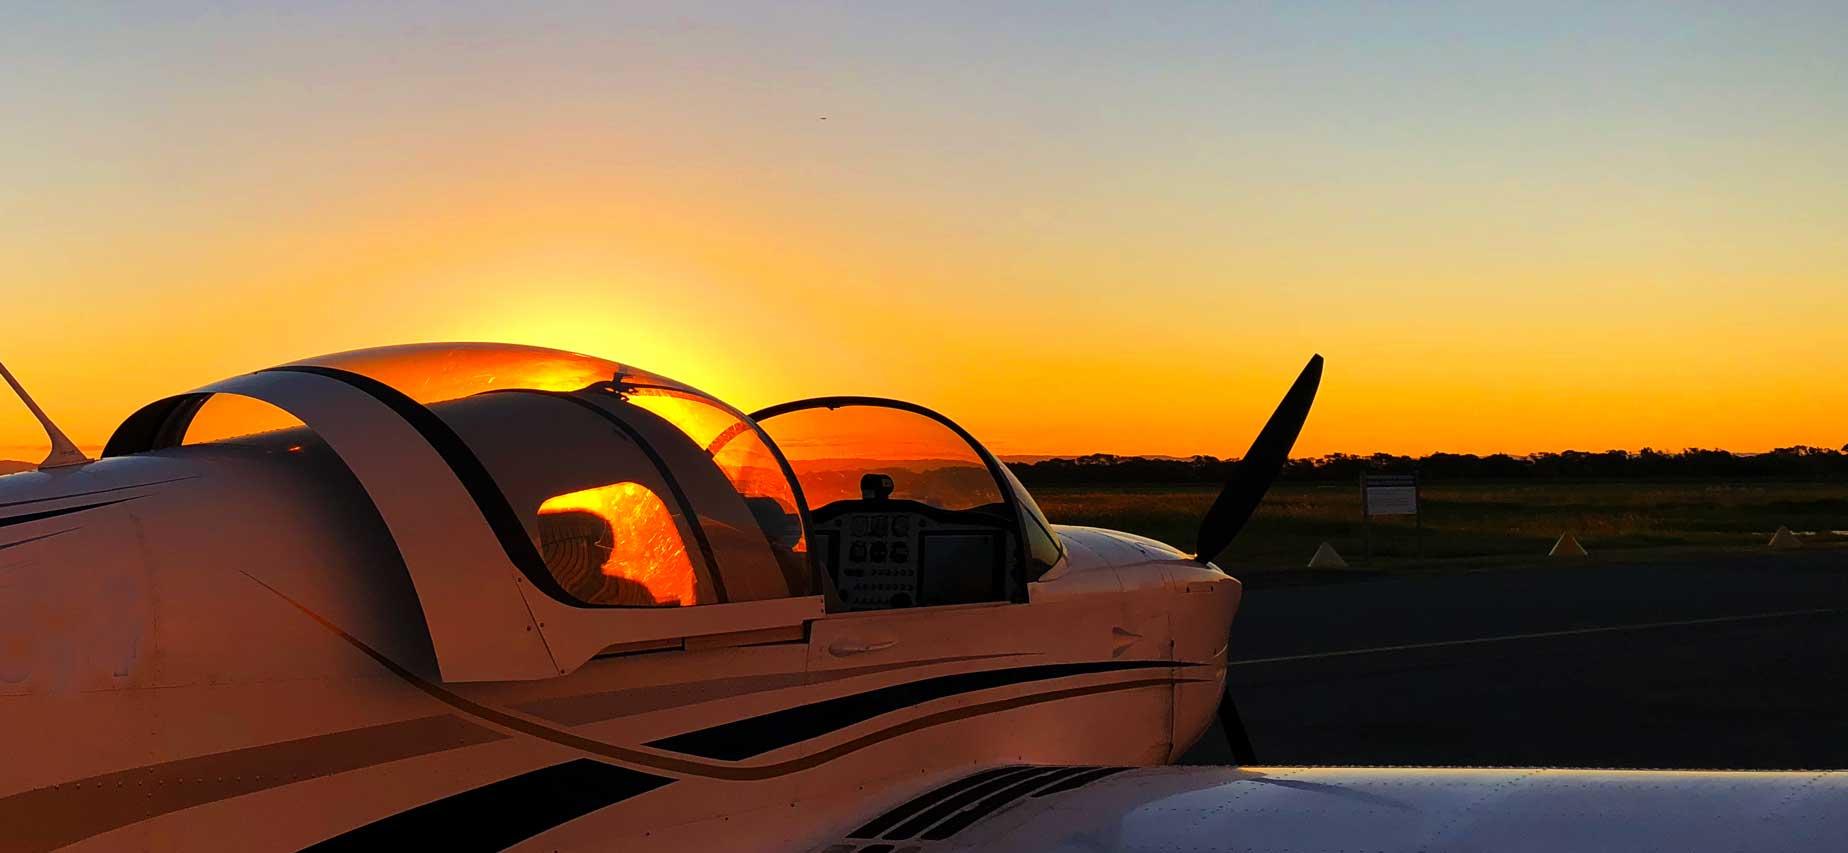 Outback Aviators 2